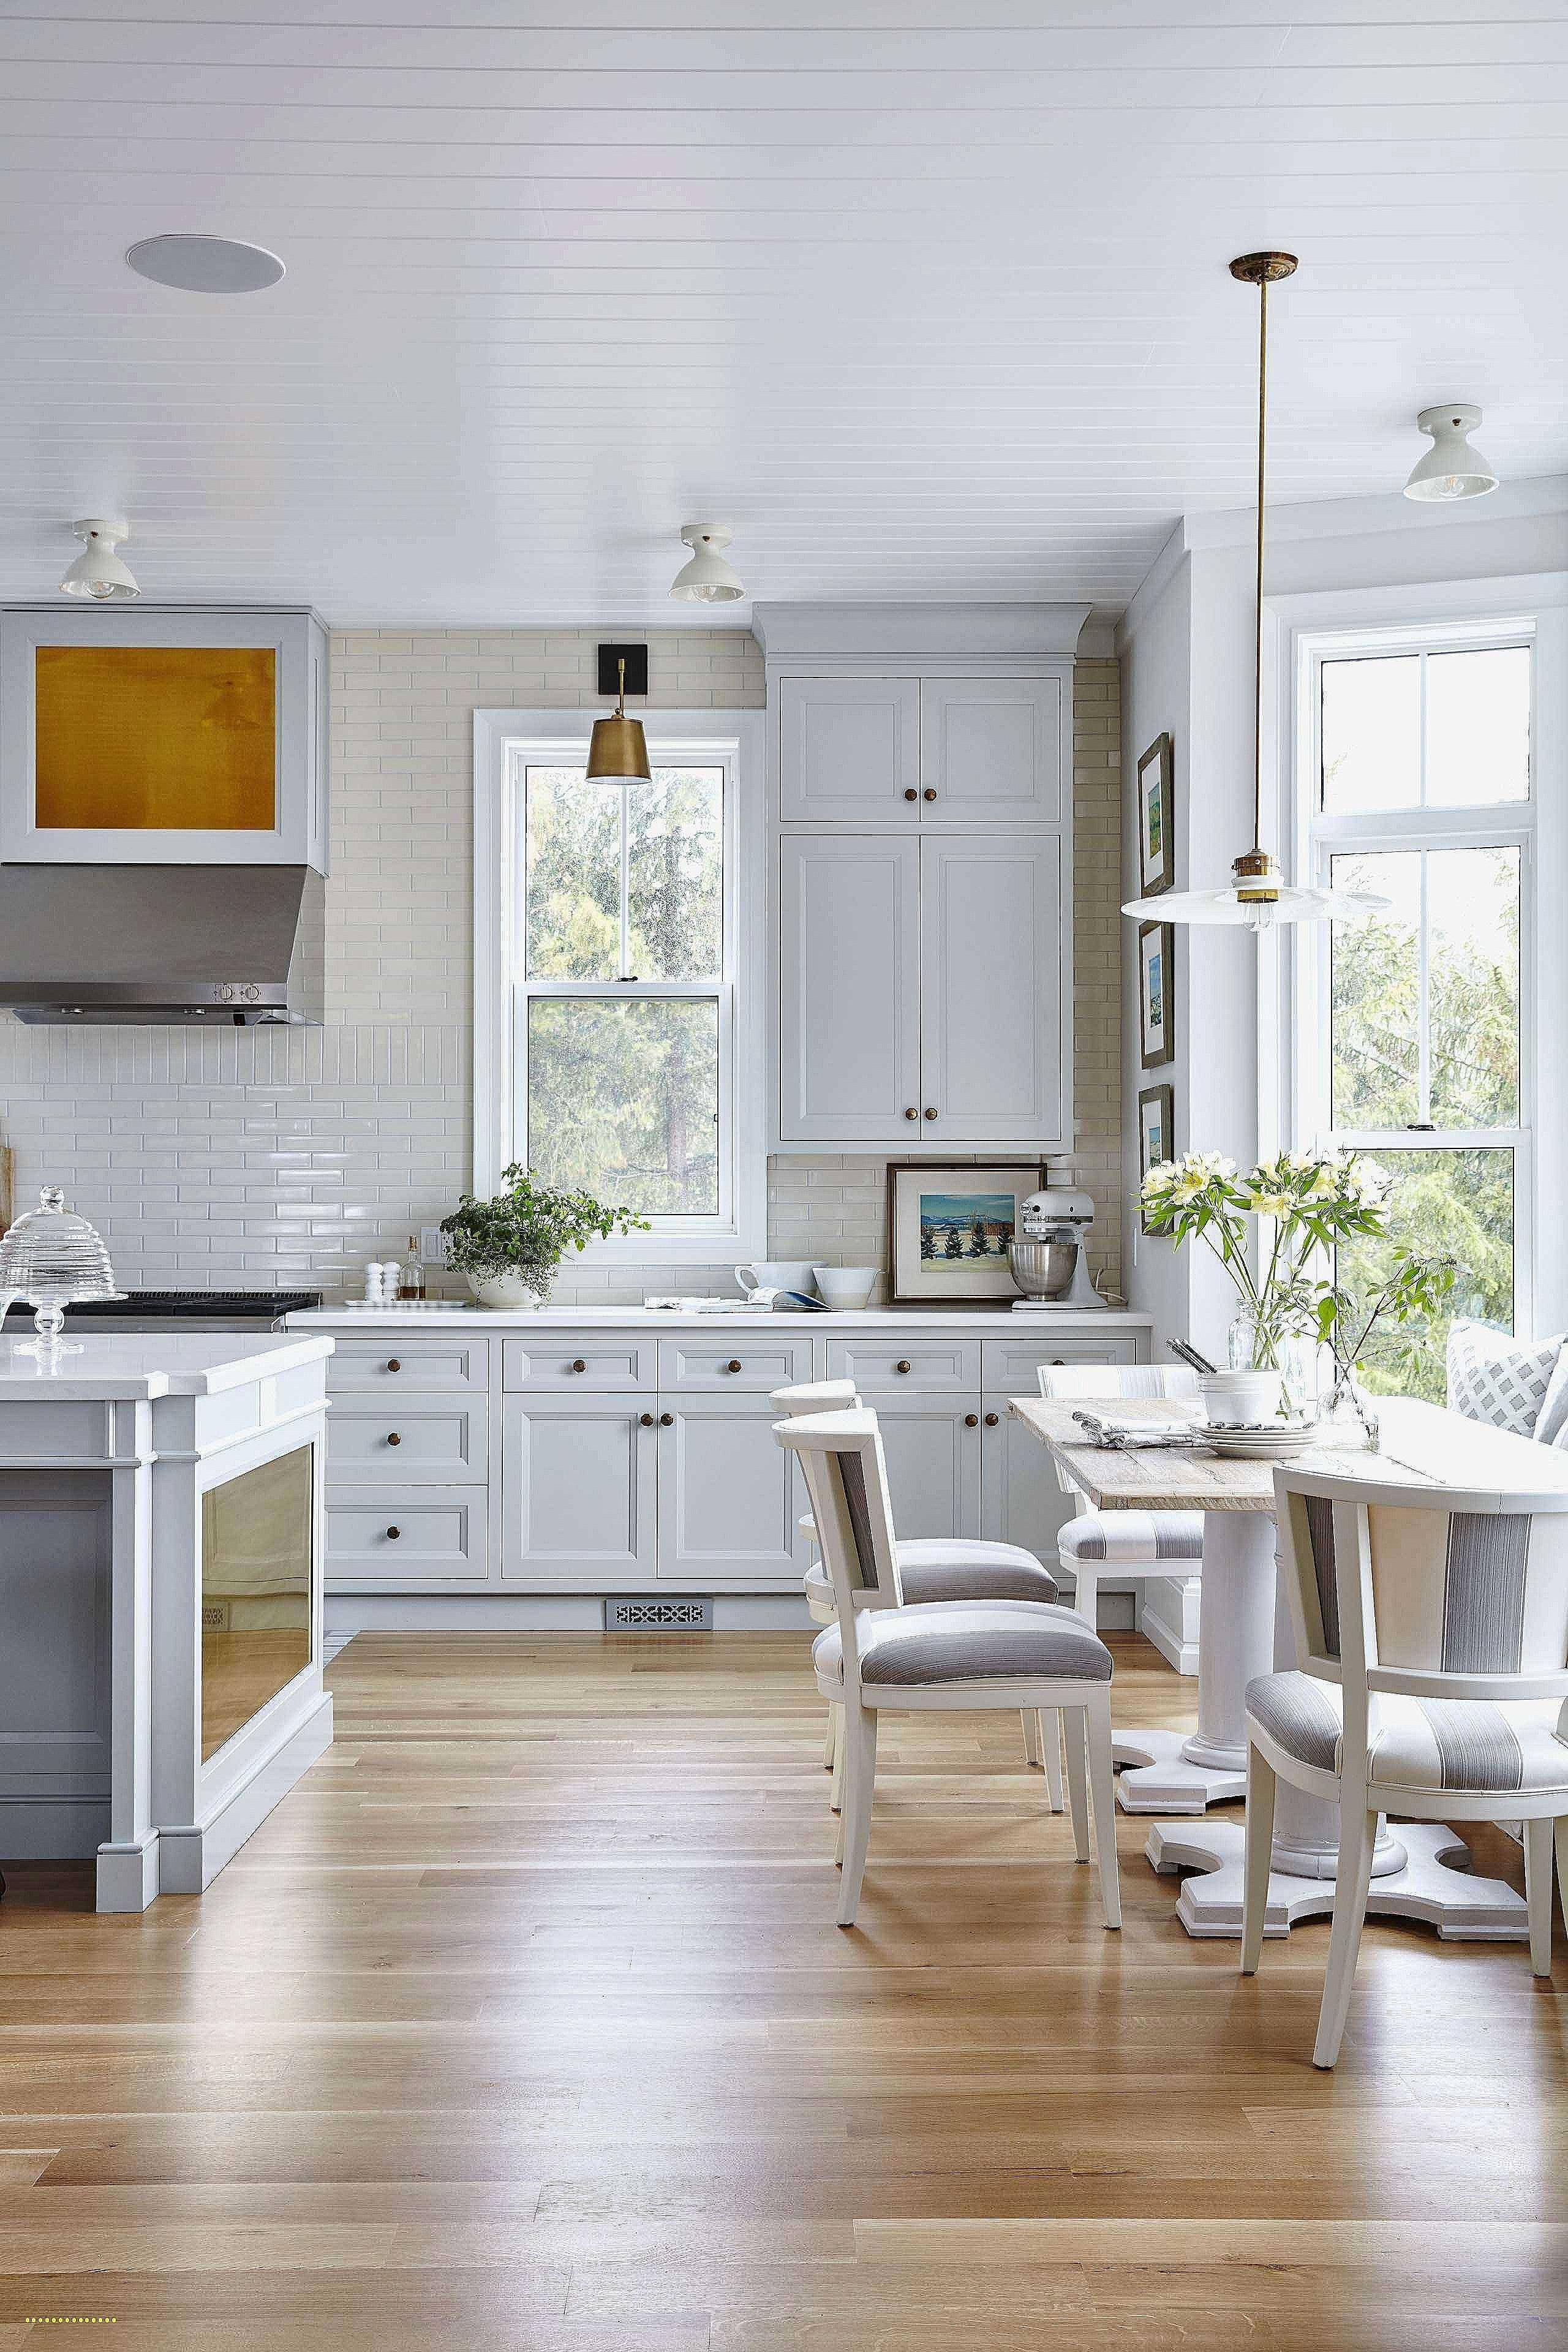 wood kitchen ideas modern unique beautiful design ideas for small kitchens of wood kitchen ideas modern